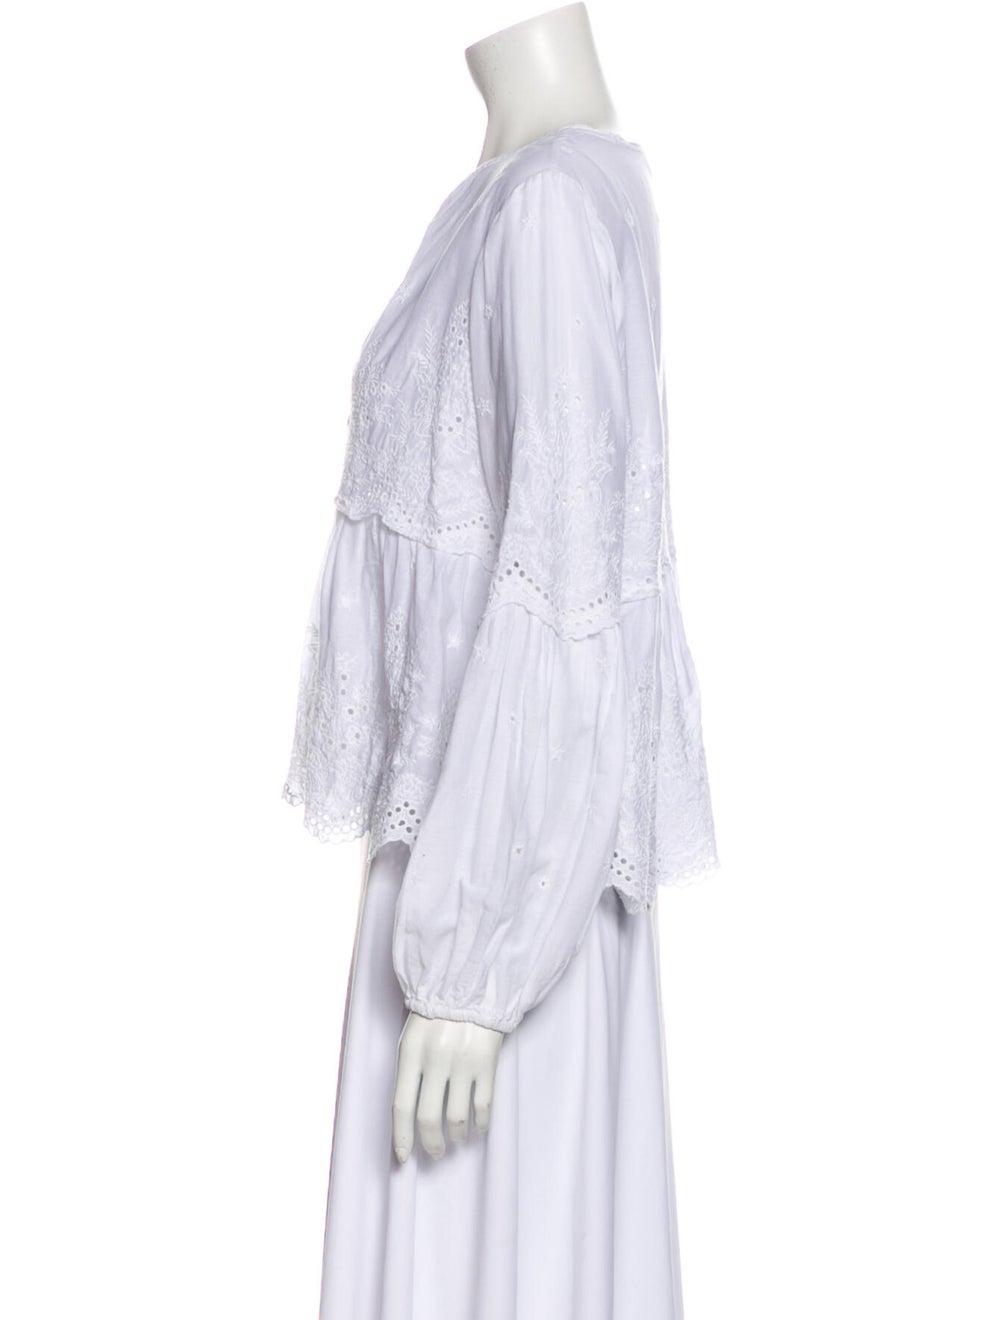 Ulla Johnson Lace Pattern V-Neck Blouse White - image 2